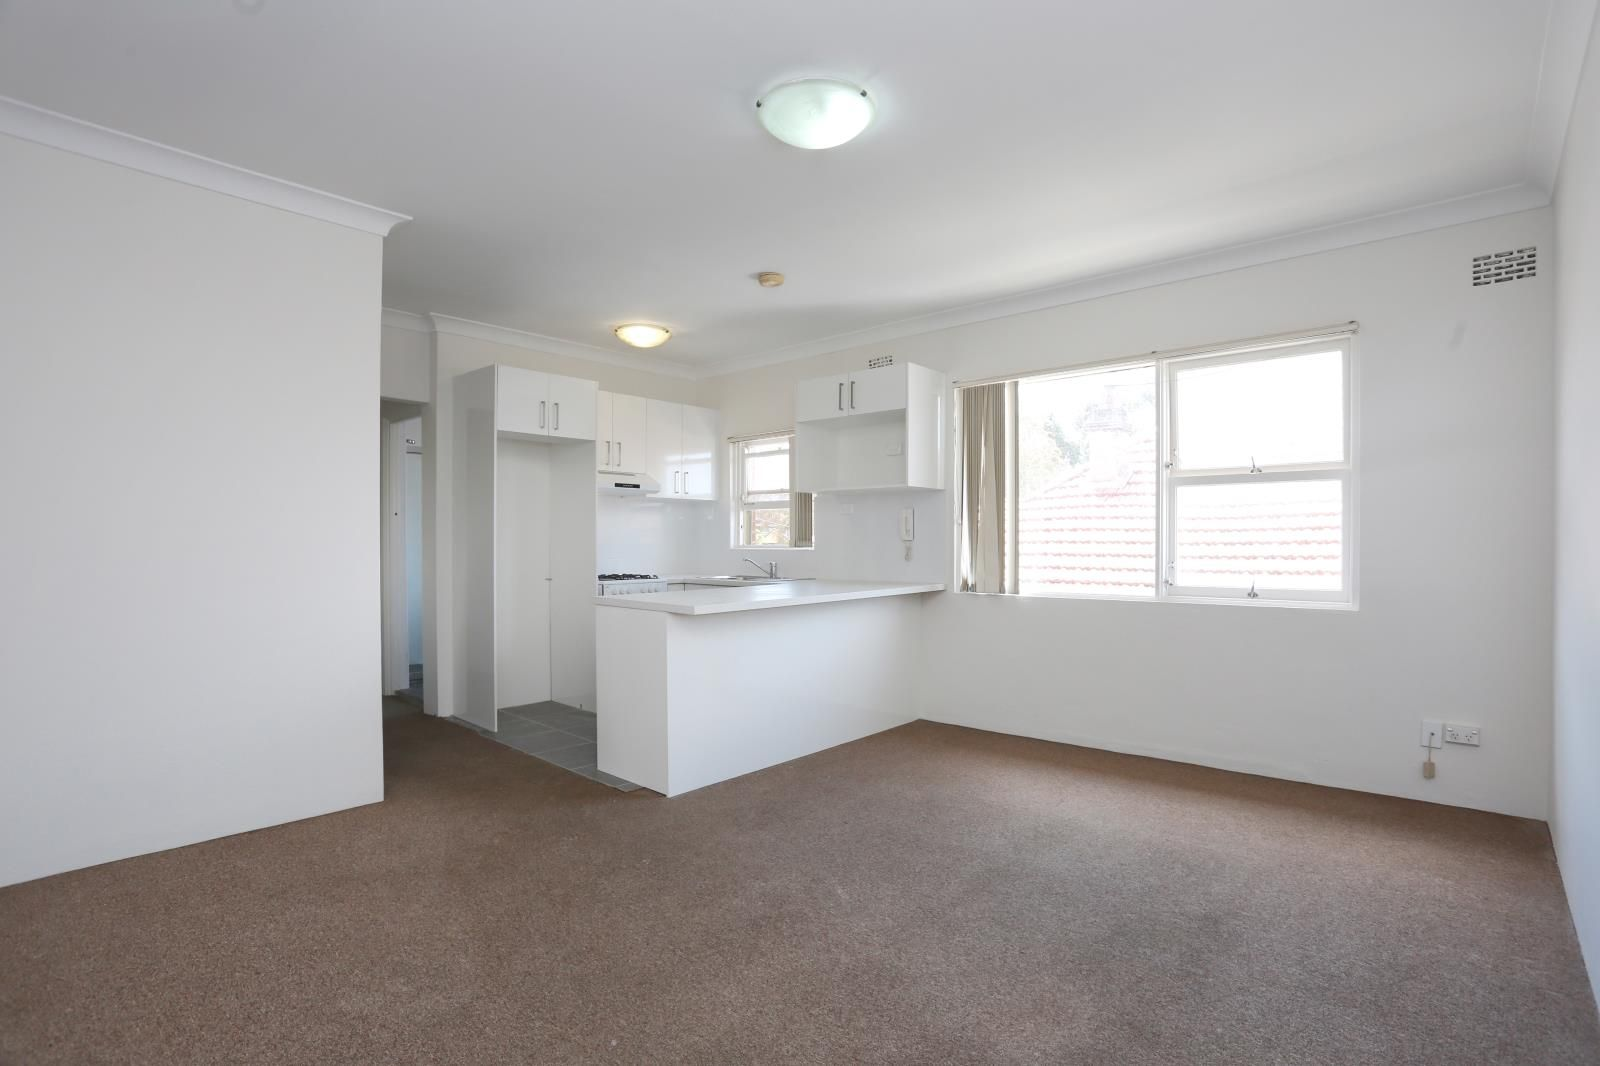 5/8 Bellevue Street, Kogarah NSW 2217, Image 2